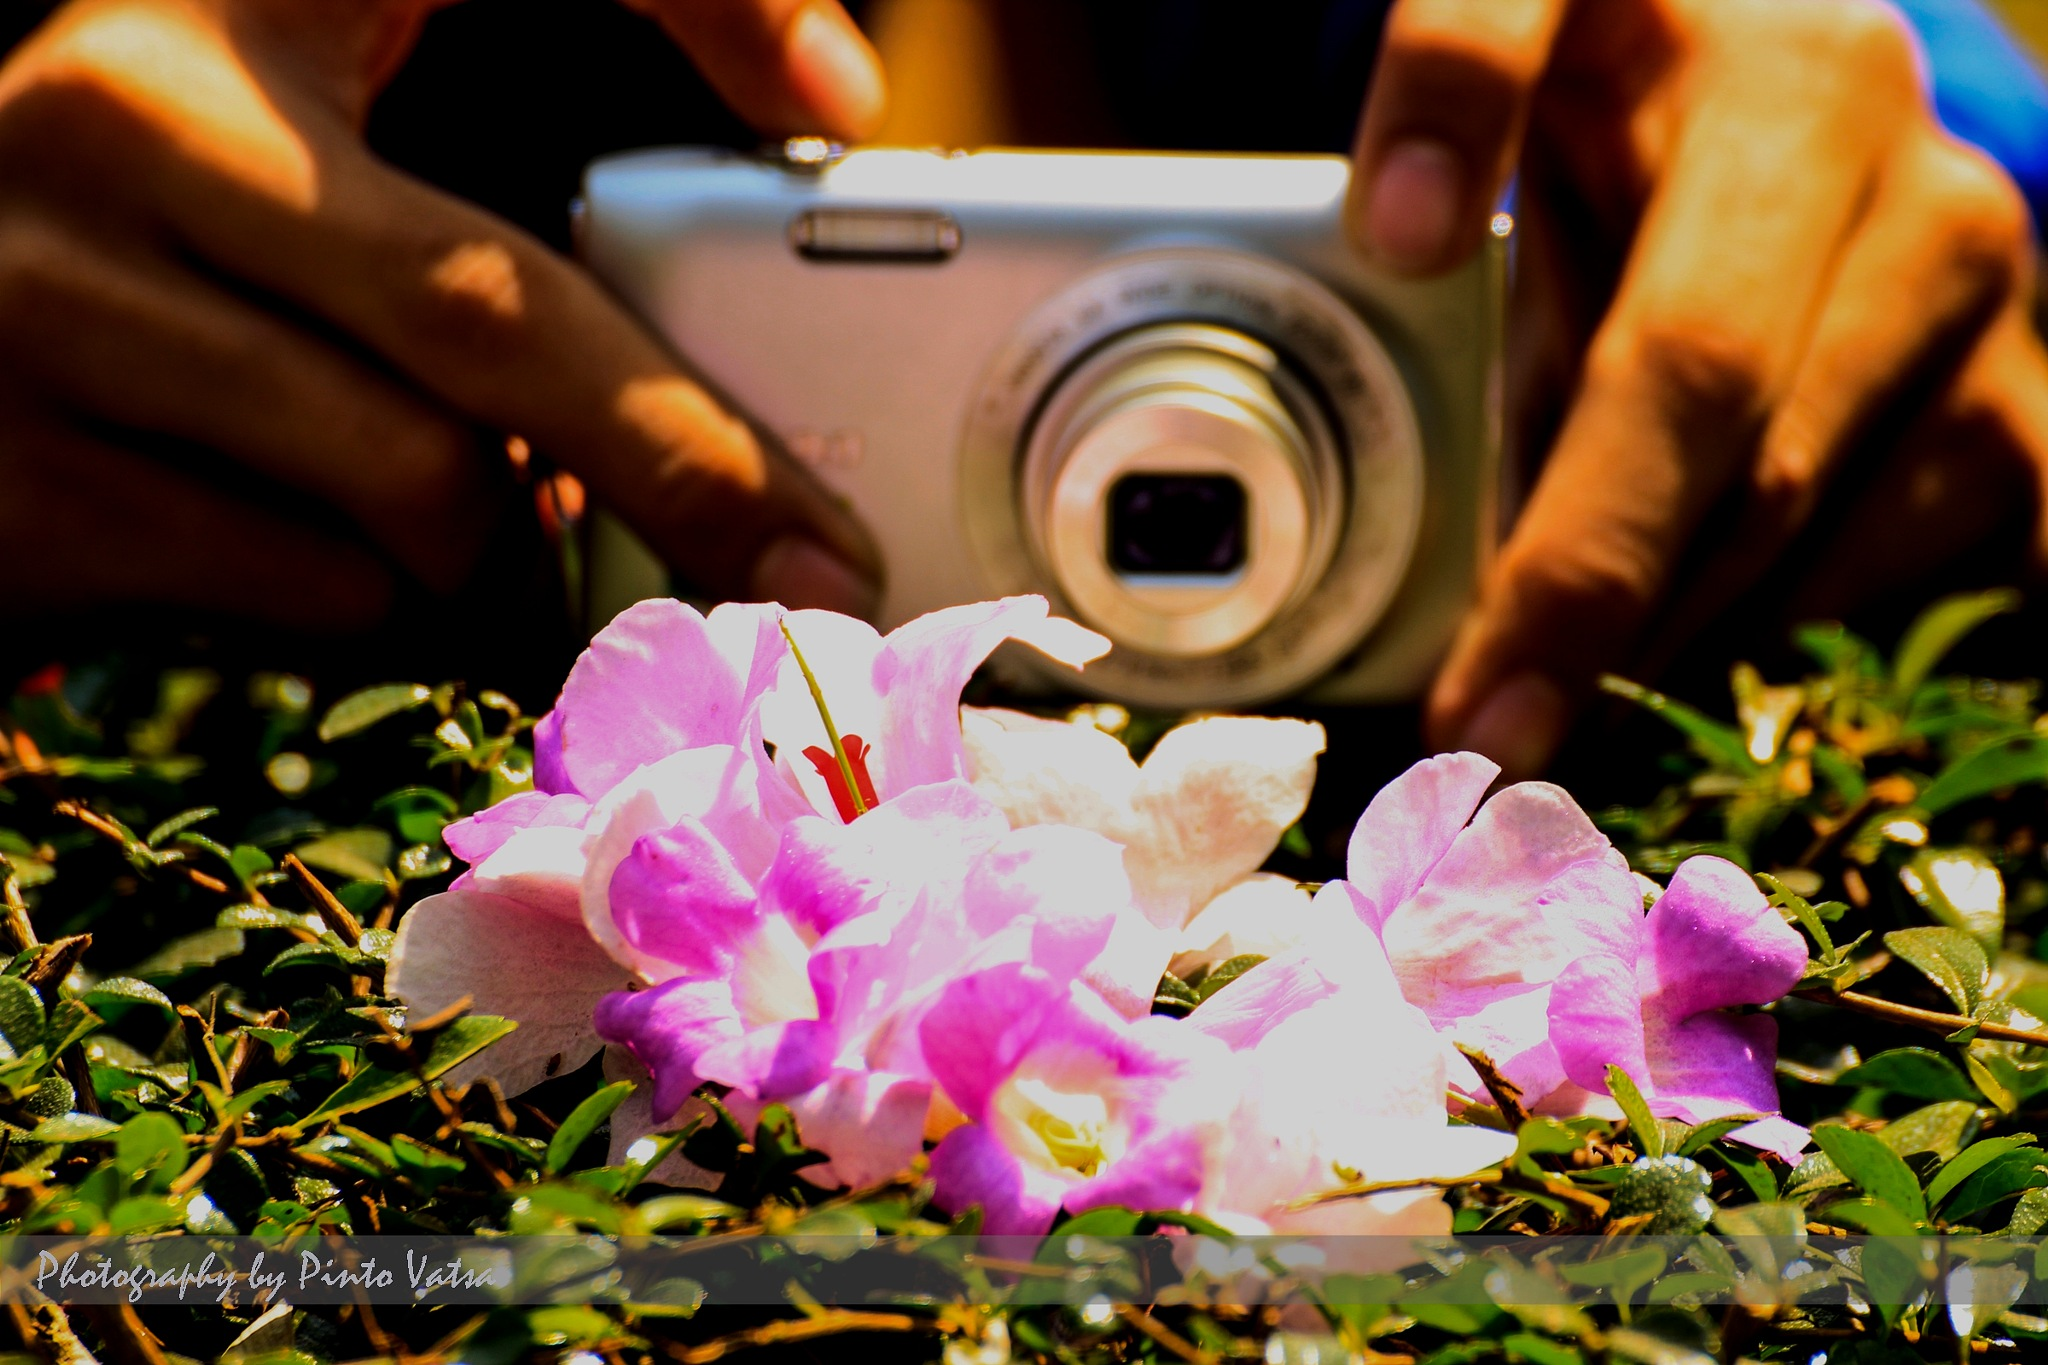 Photo in a photo by Arunesh Singh